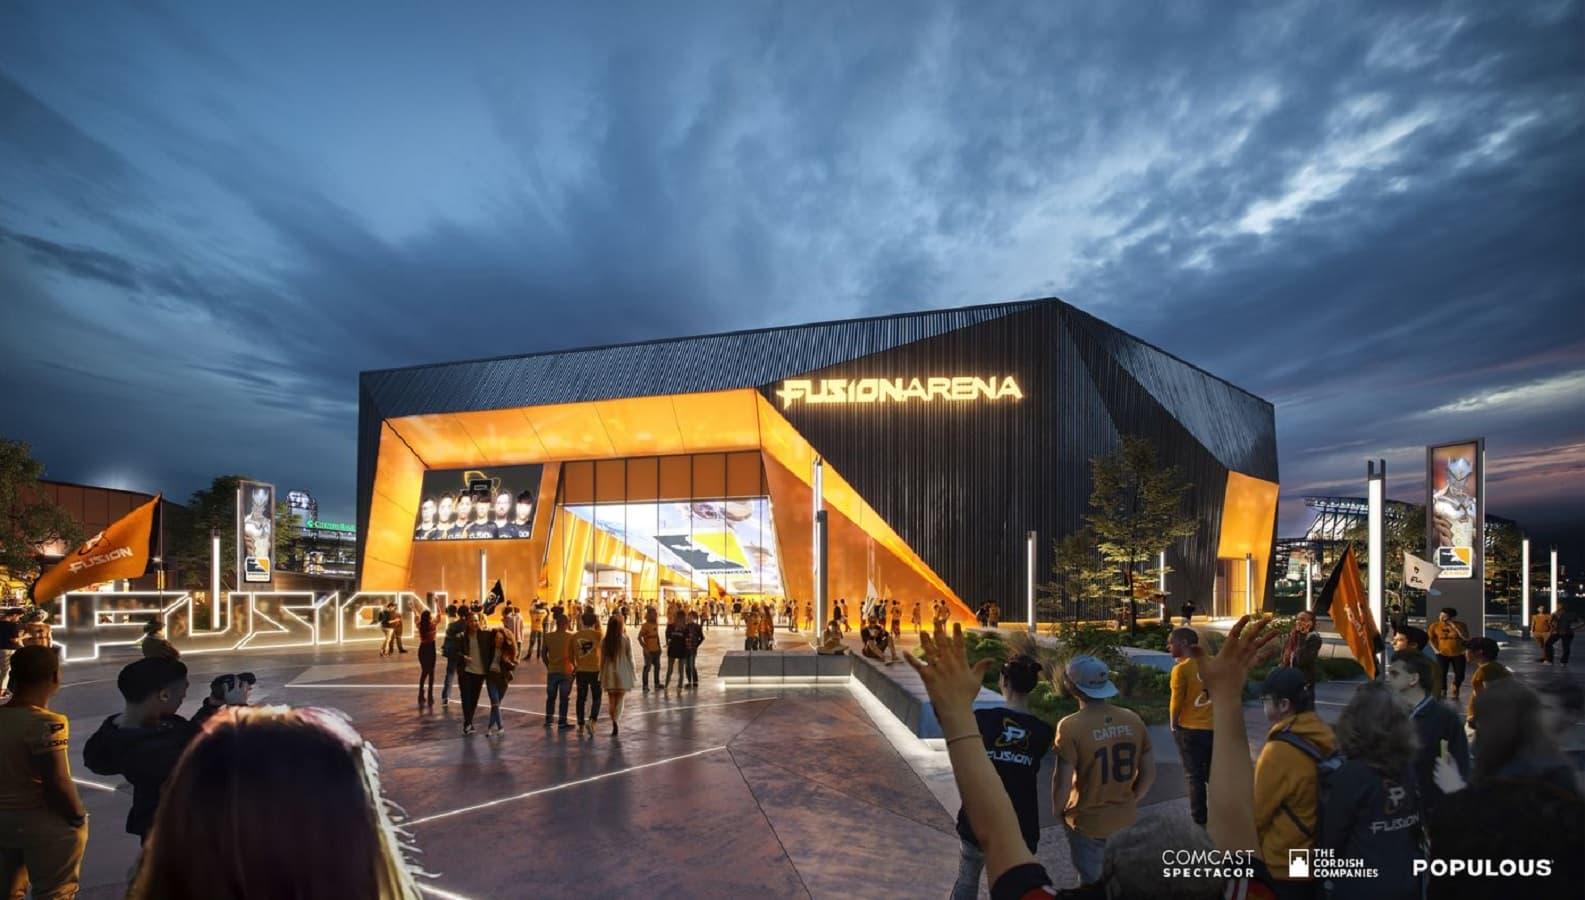 comcast fusion arena mockup in philadelphia